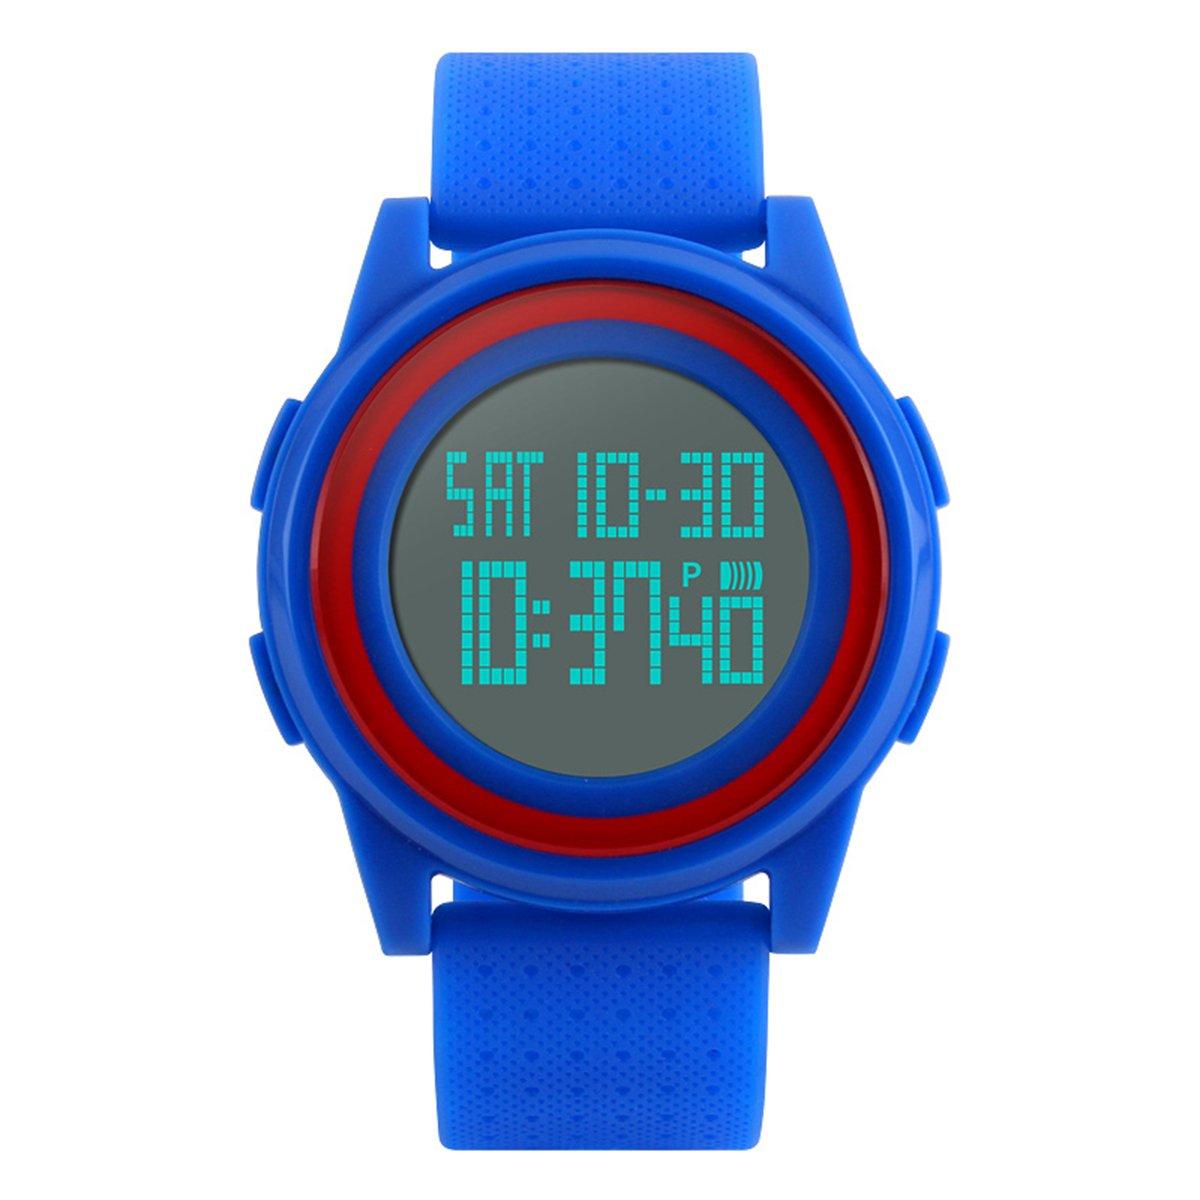 Kids Digital Sport Watch LED Military Waterproof Luminous Stopwatch Alarm Simple Wristwatch (blue) by BesWlz